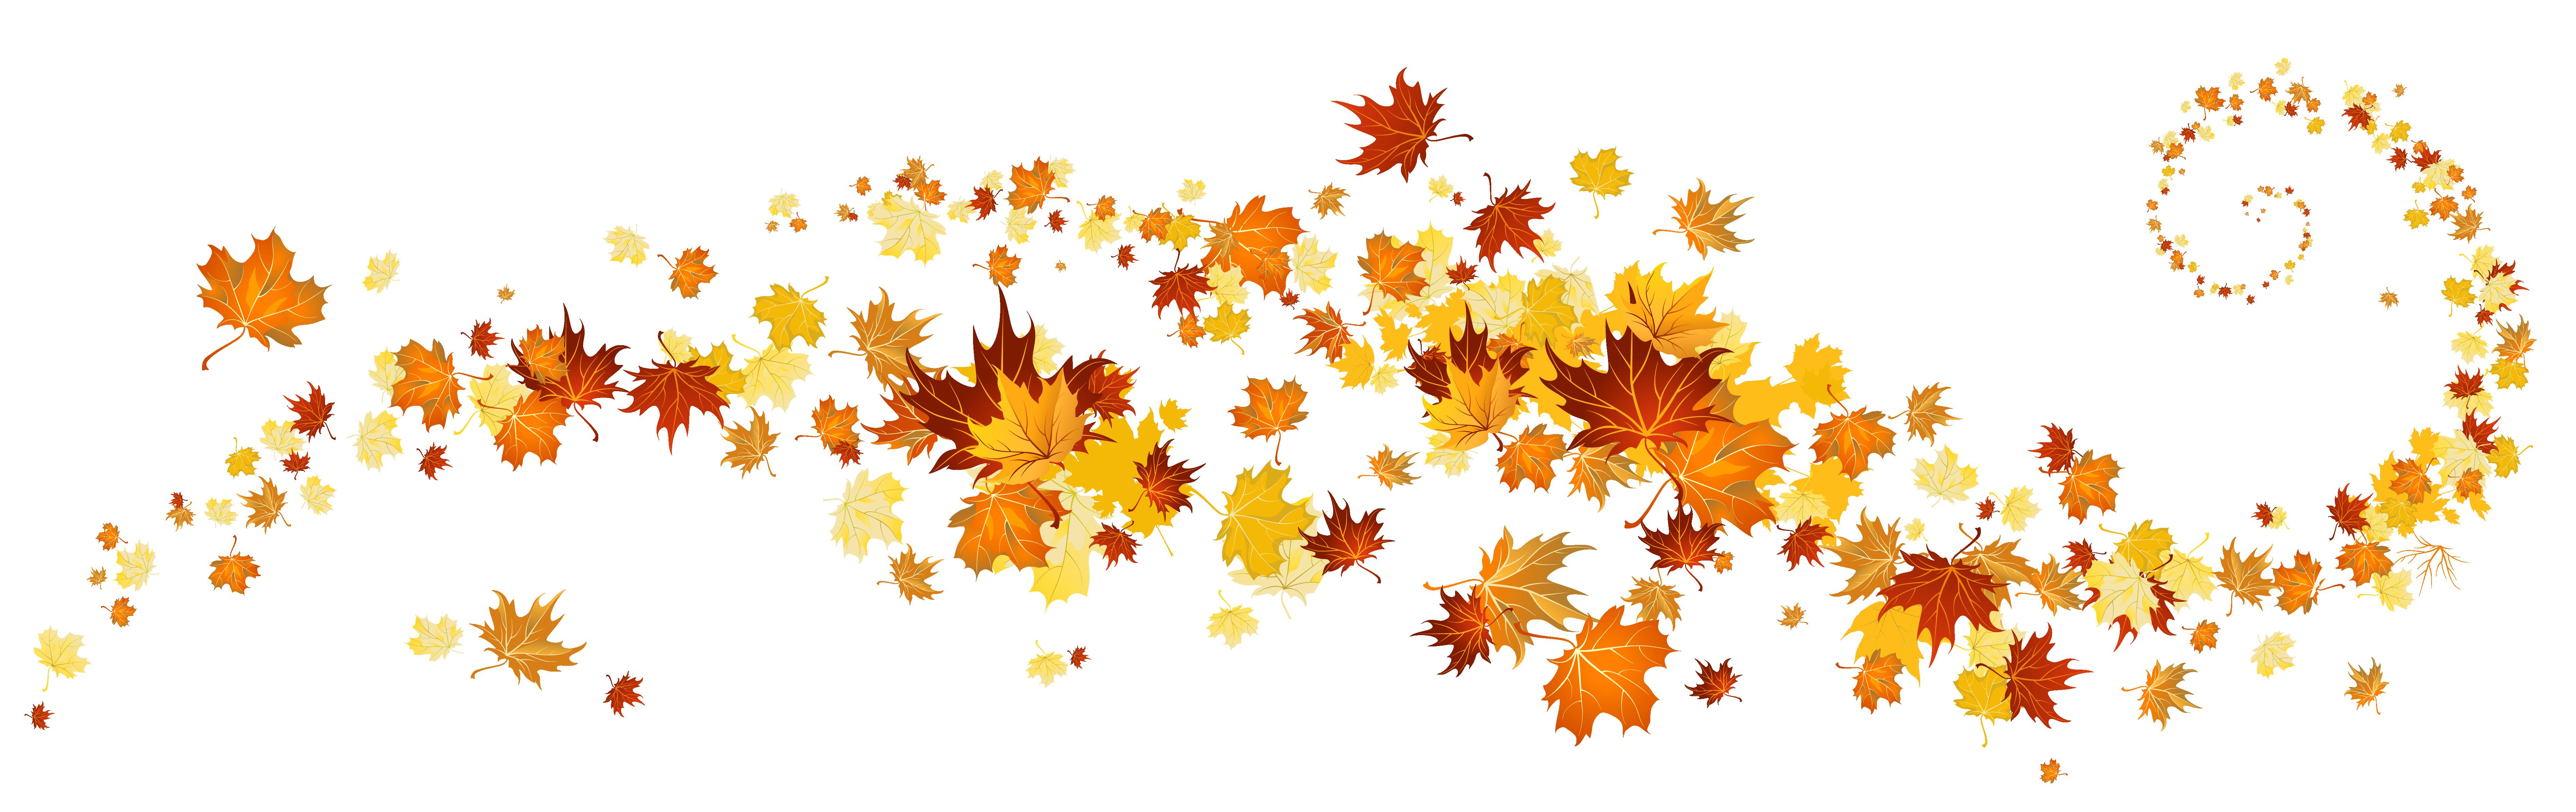 Leaves Fall Leaf Clip Art .-leaves fall leaf clip art .-19